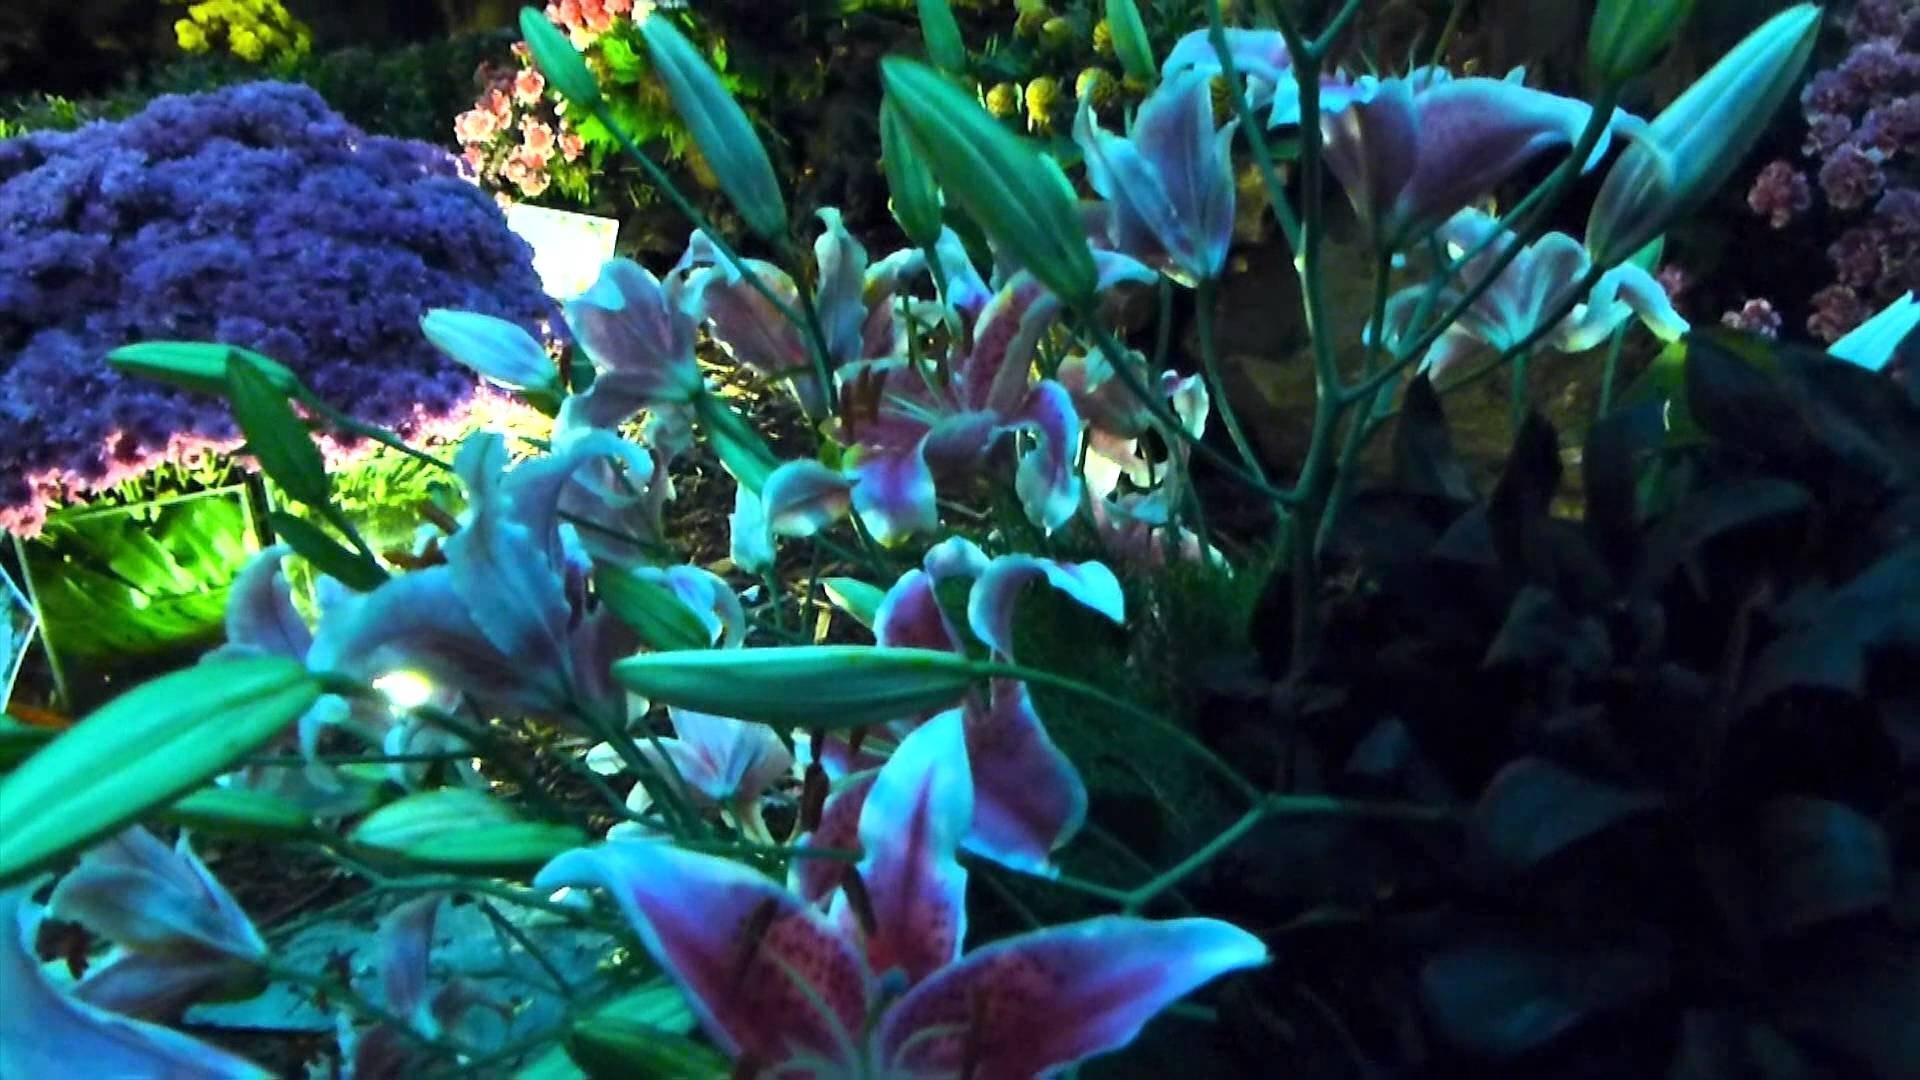 Floresplantamother Nature High Definition Nature Wallpaper Full 1920x1080